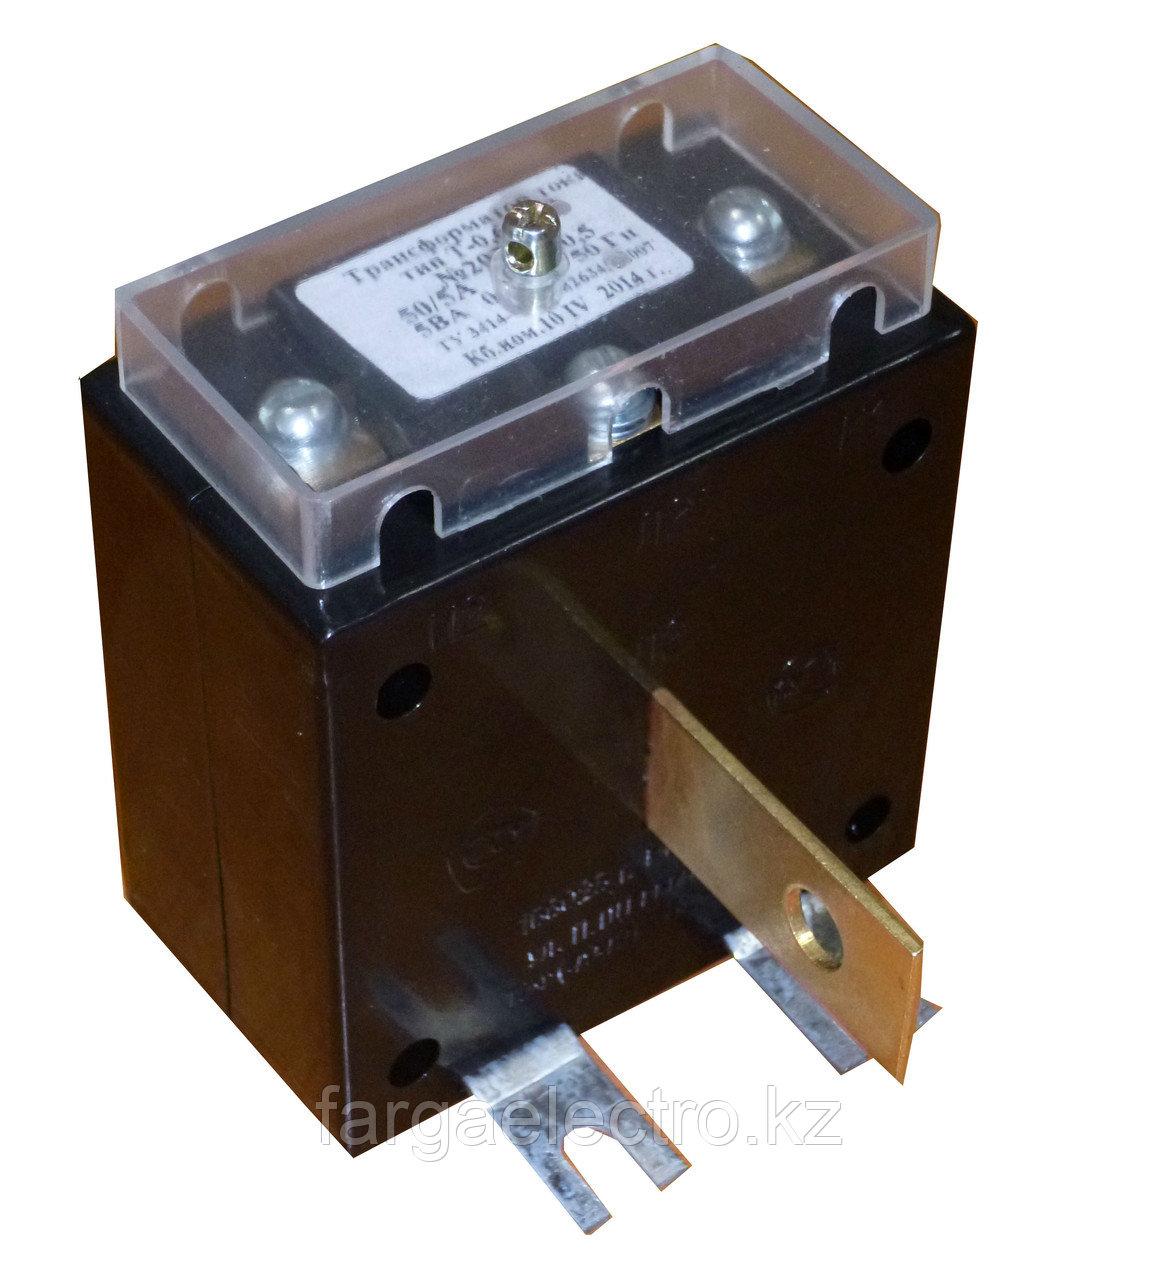 Трансформатор тока Т-0,66 200/5